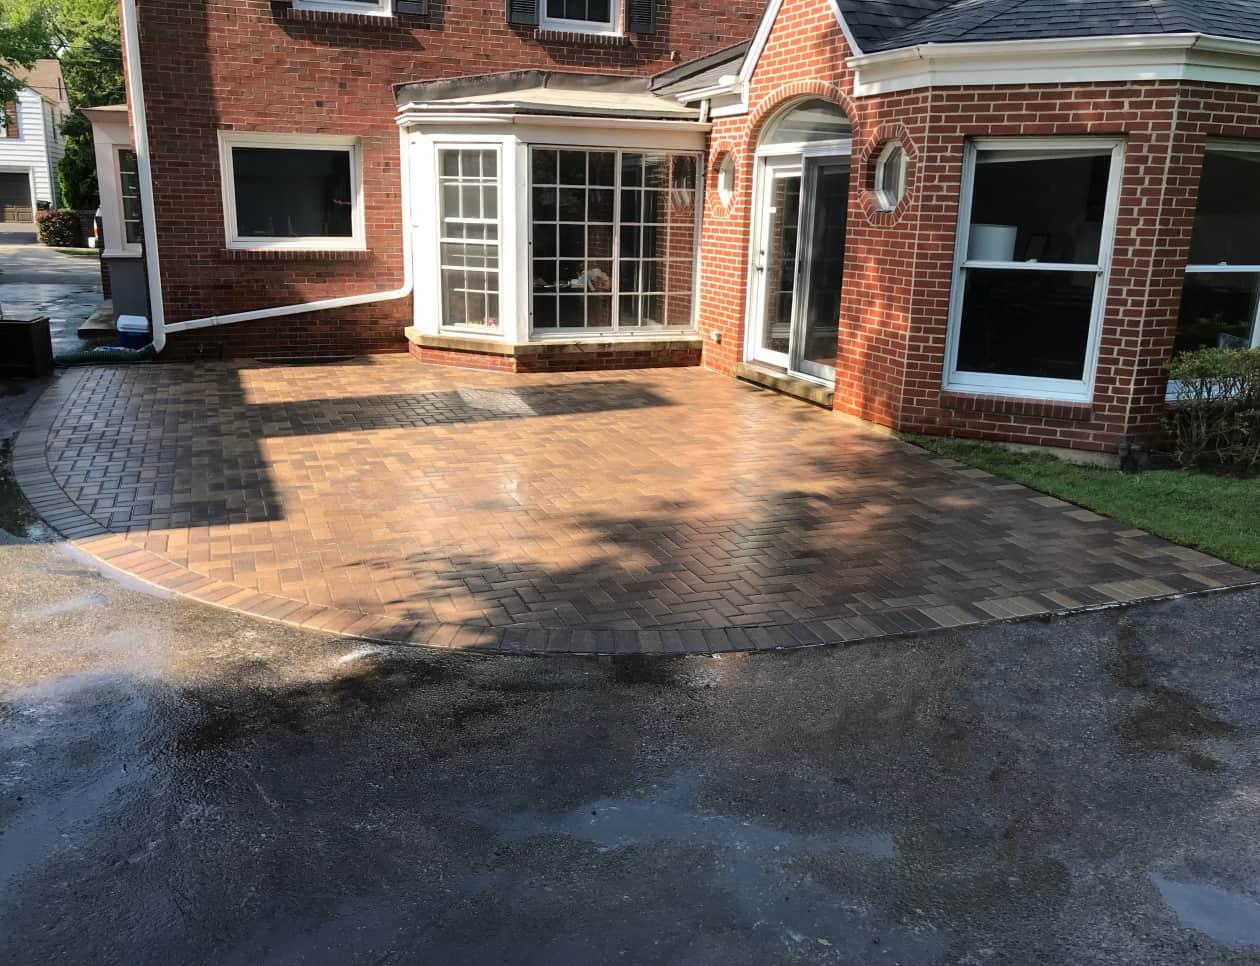 brick patio near house